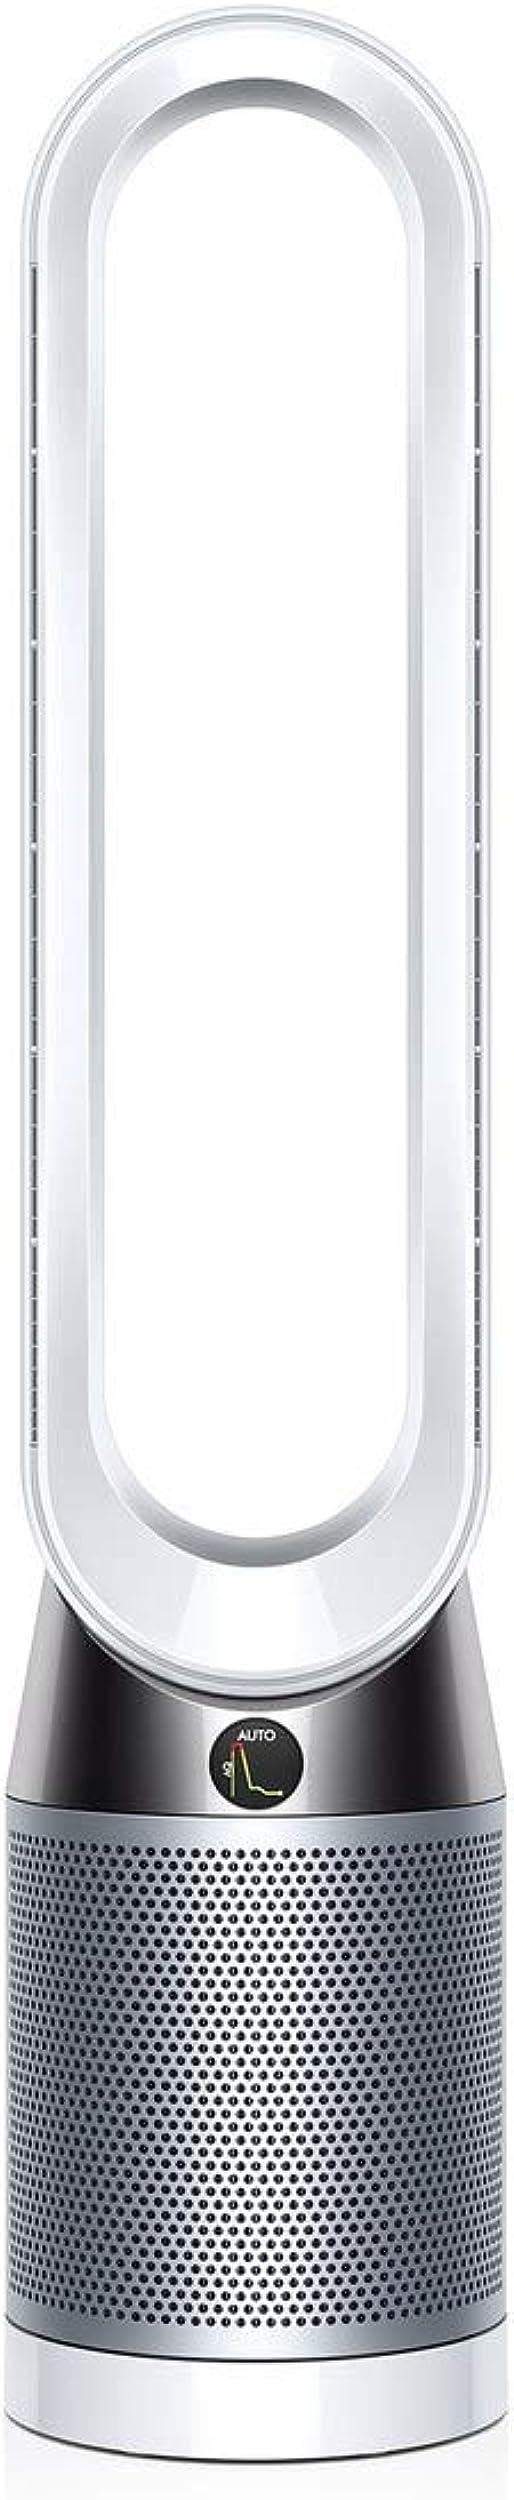 Dyson ventilatore/purificatore a torre TP04